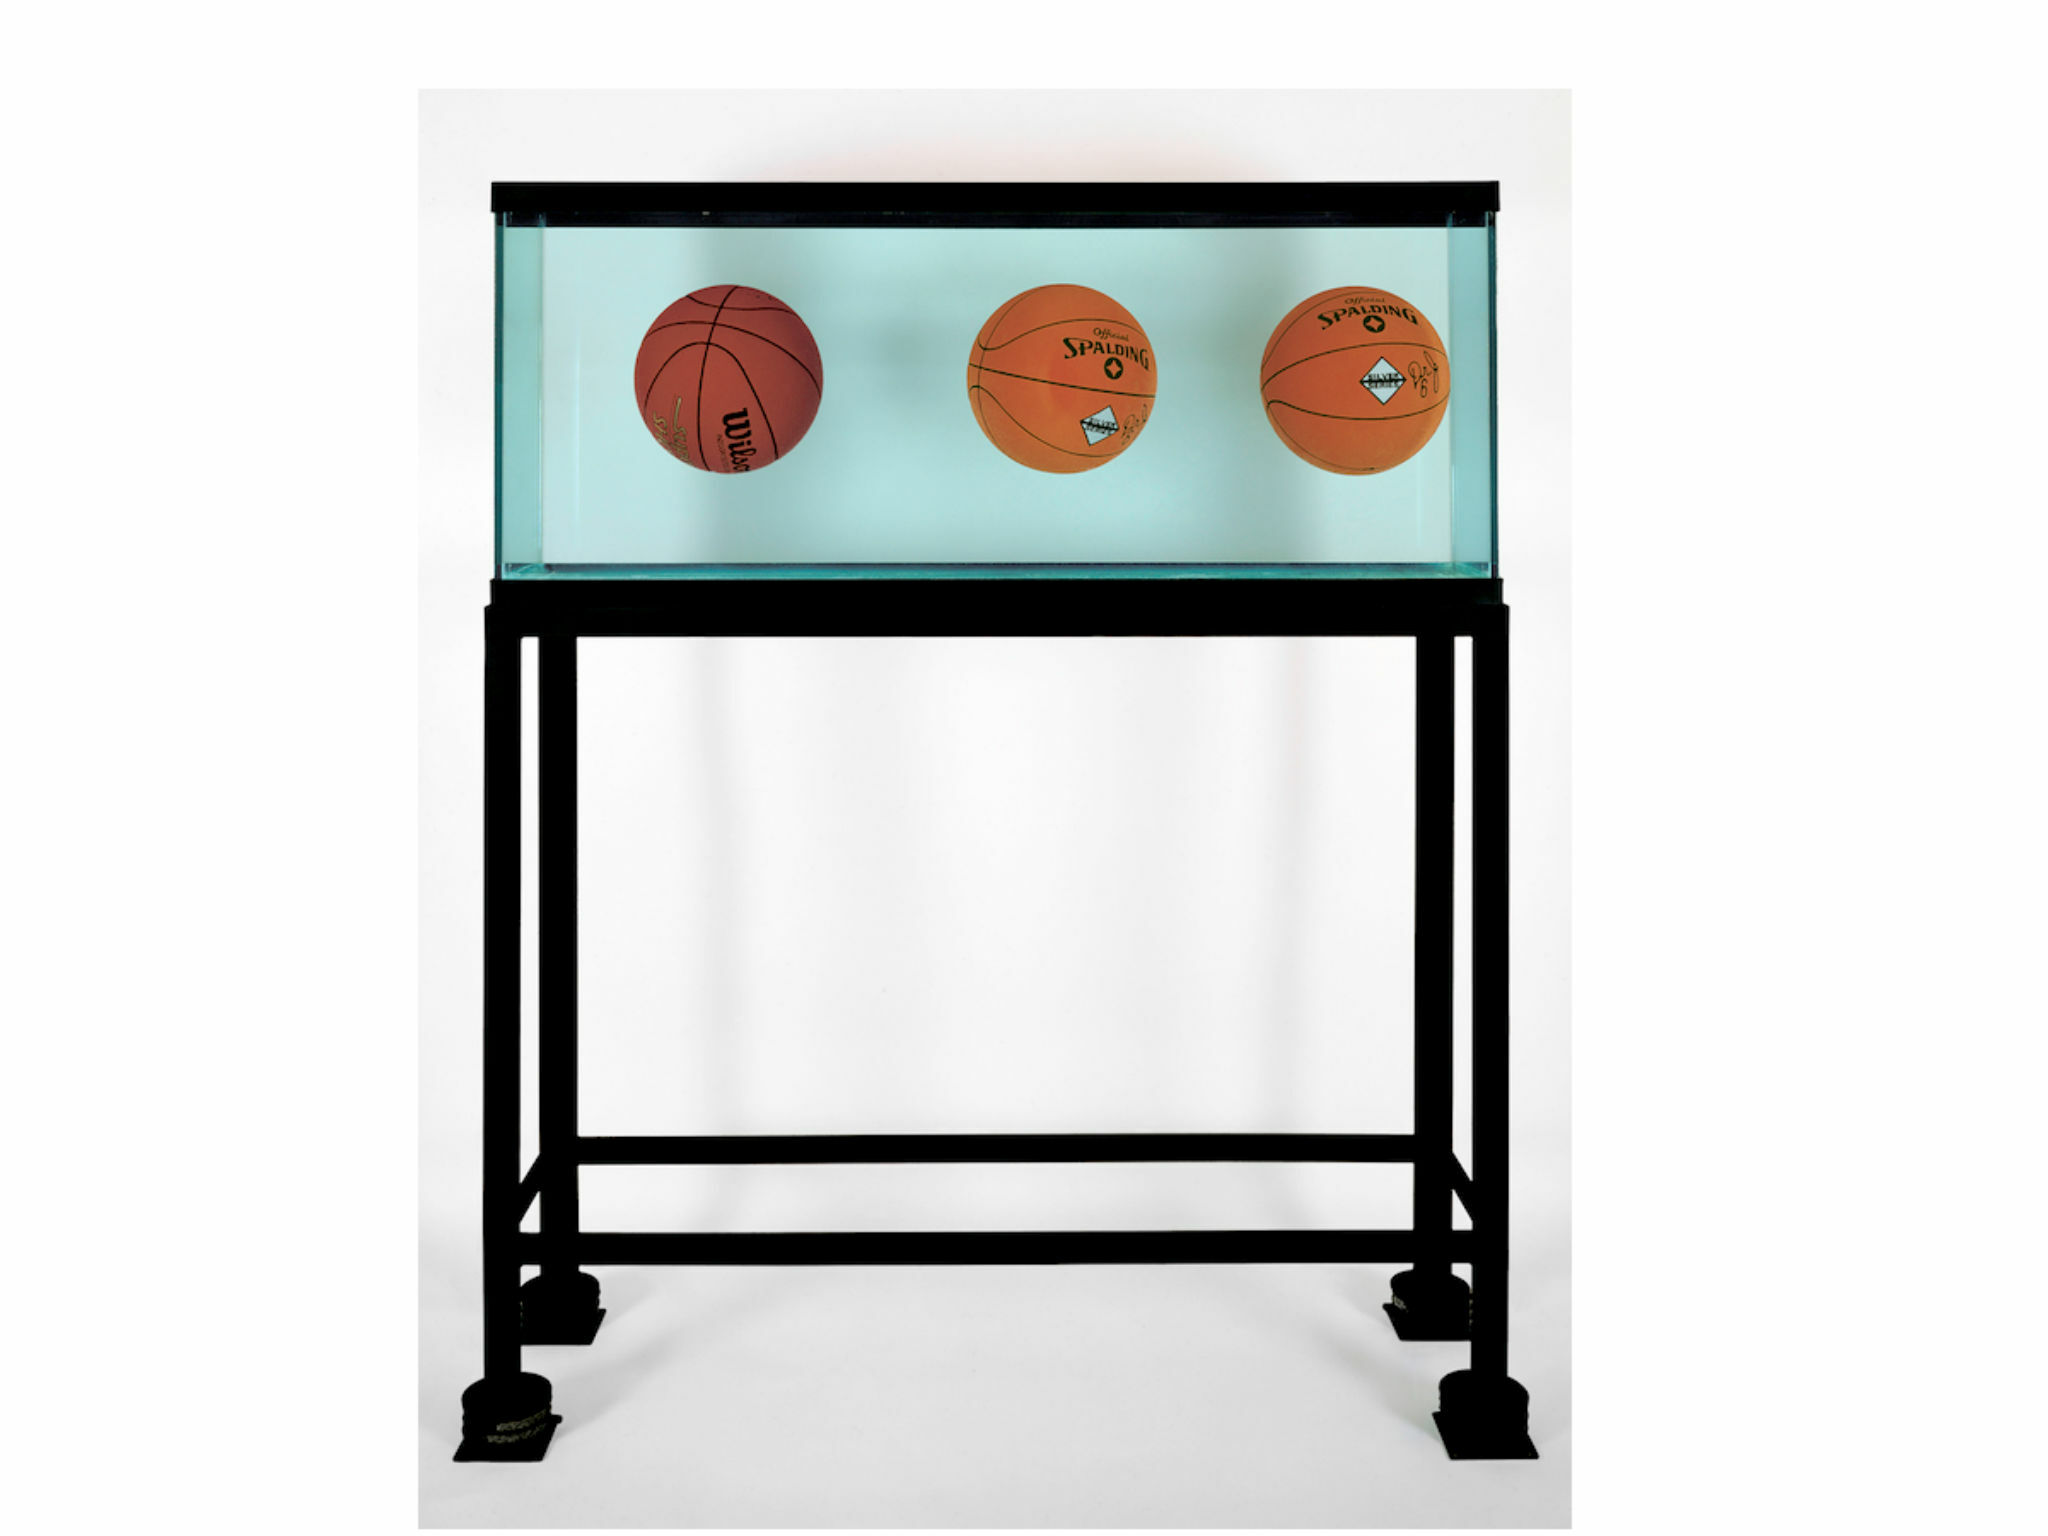 Obra de Jeff Koons en el Museo Jumex en 2019